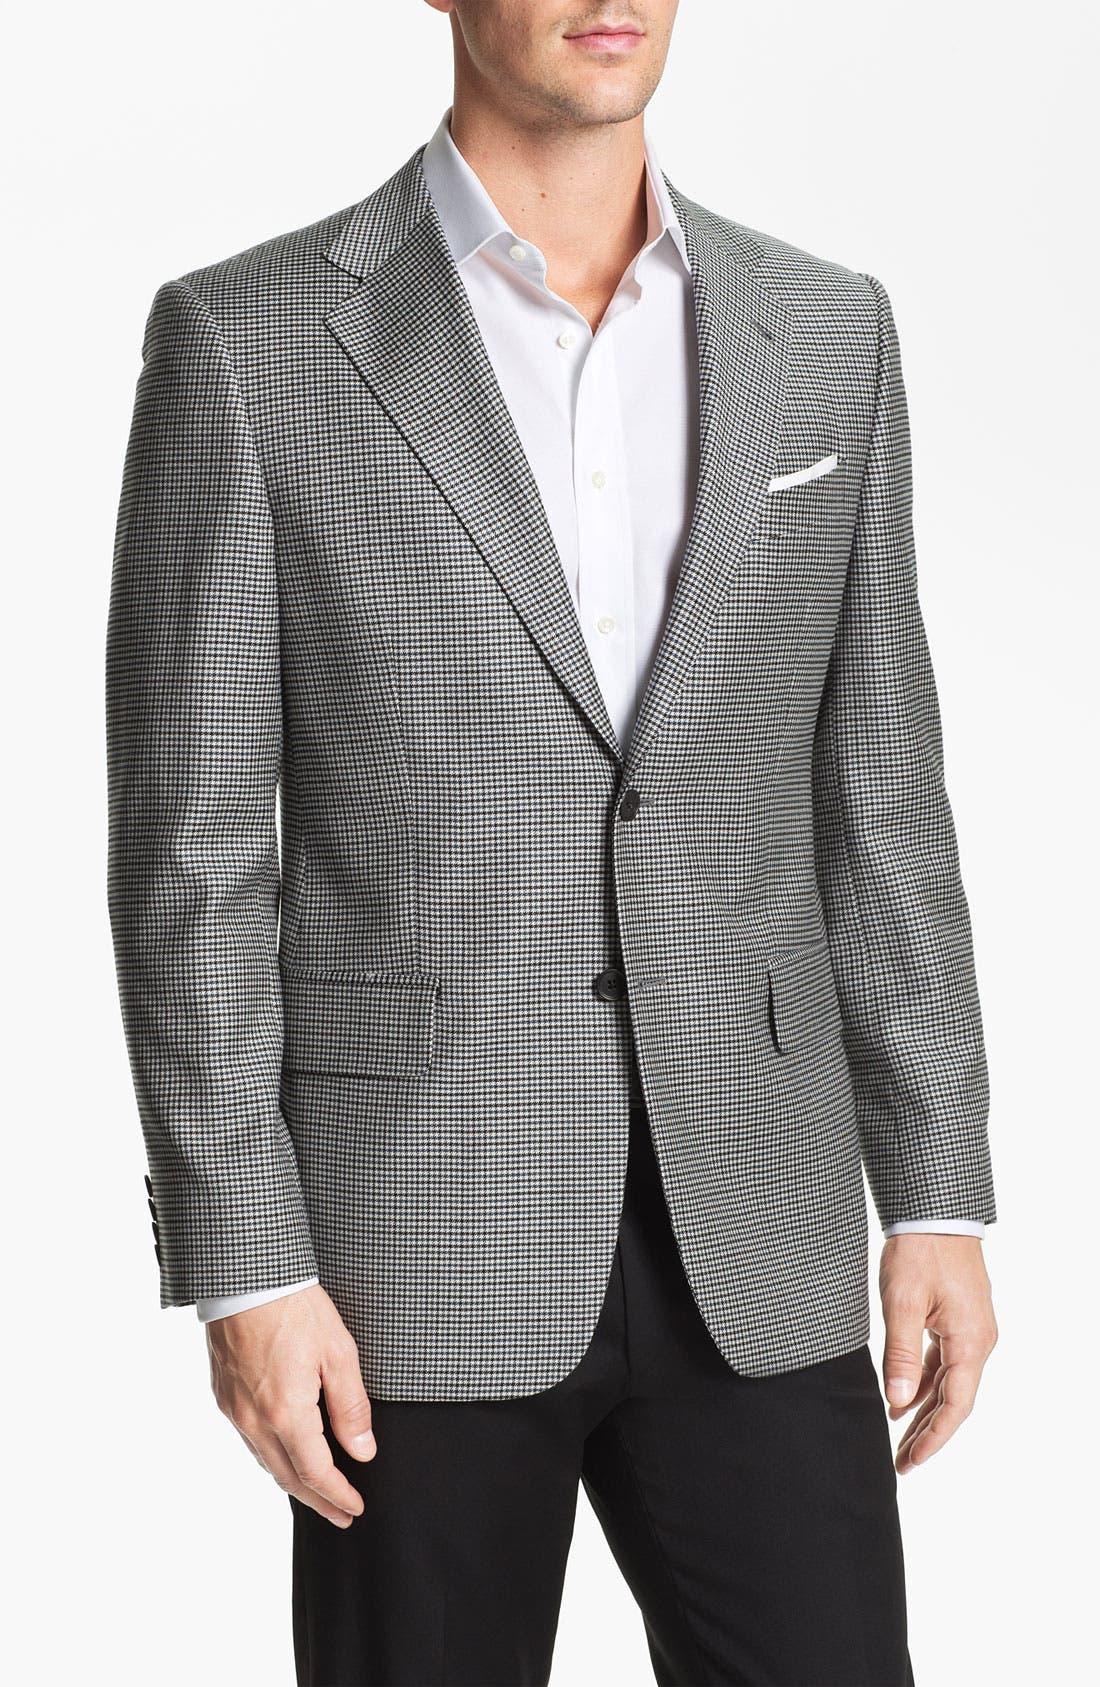 Main Image - Joseph Abboud Check Sportcoat